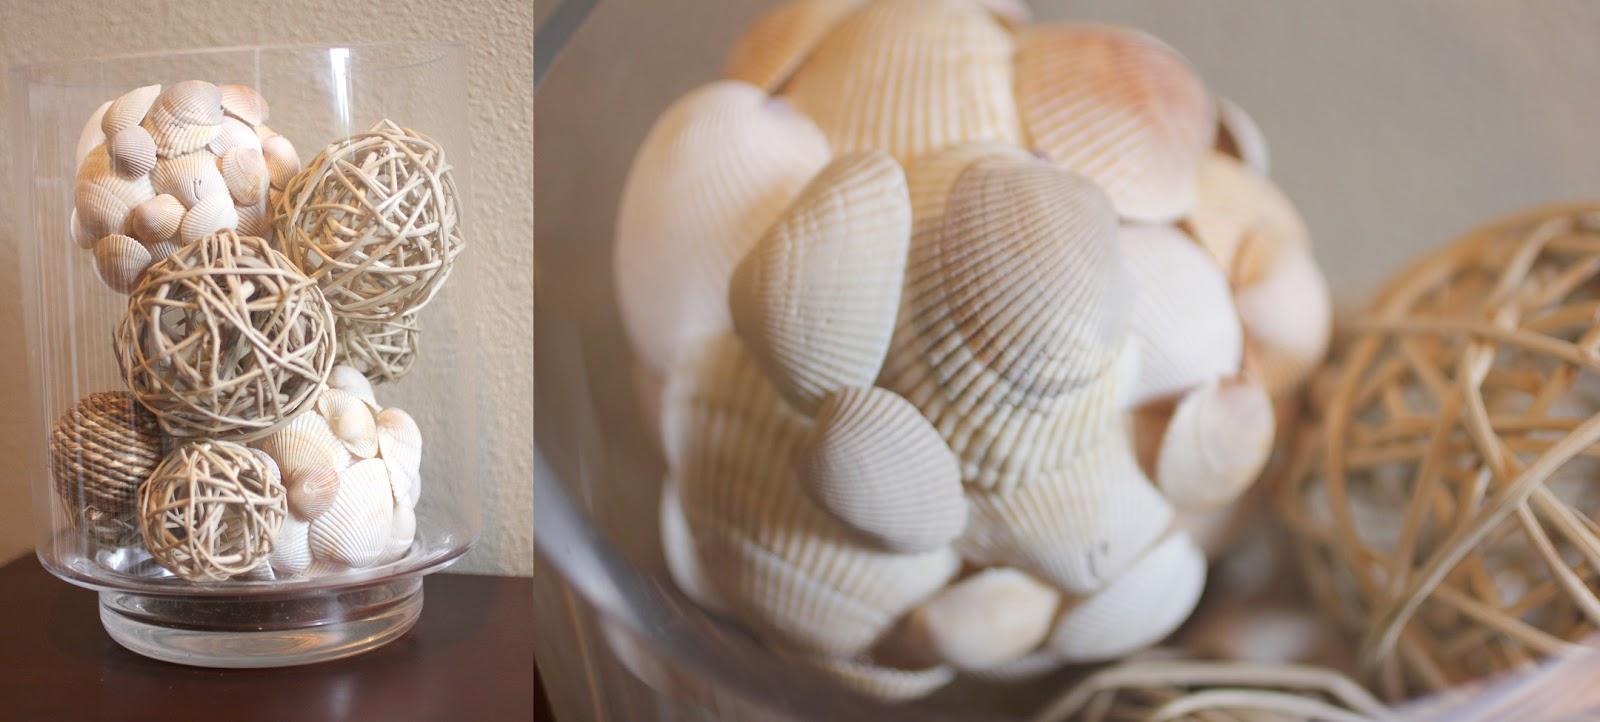 Decorative seashell craft ideas - Seashell Crafts